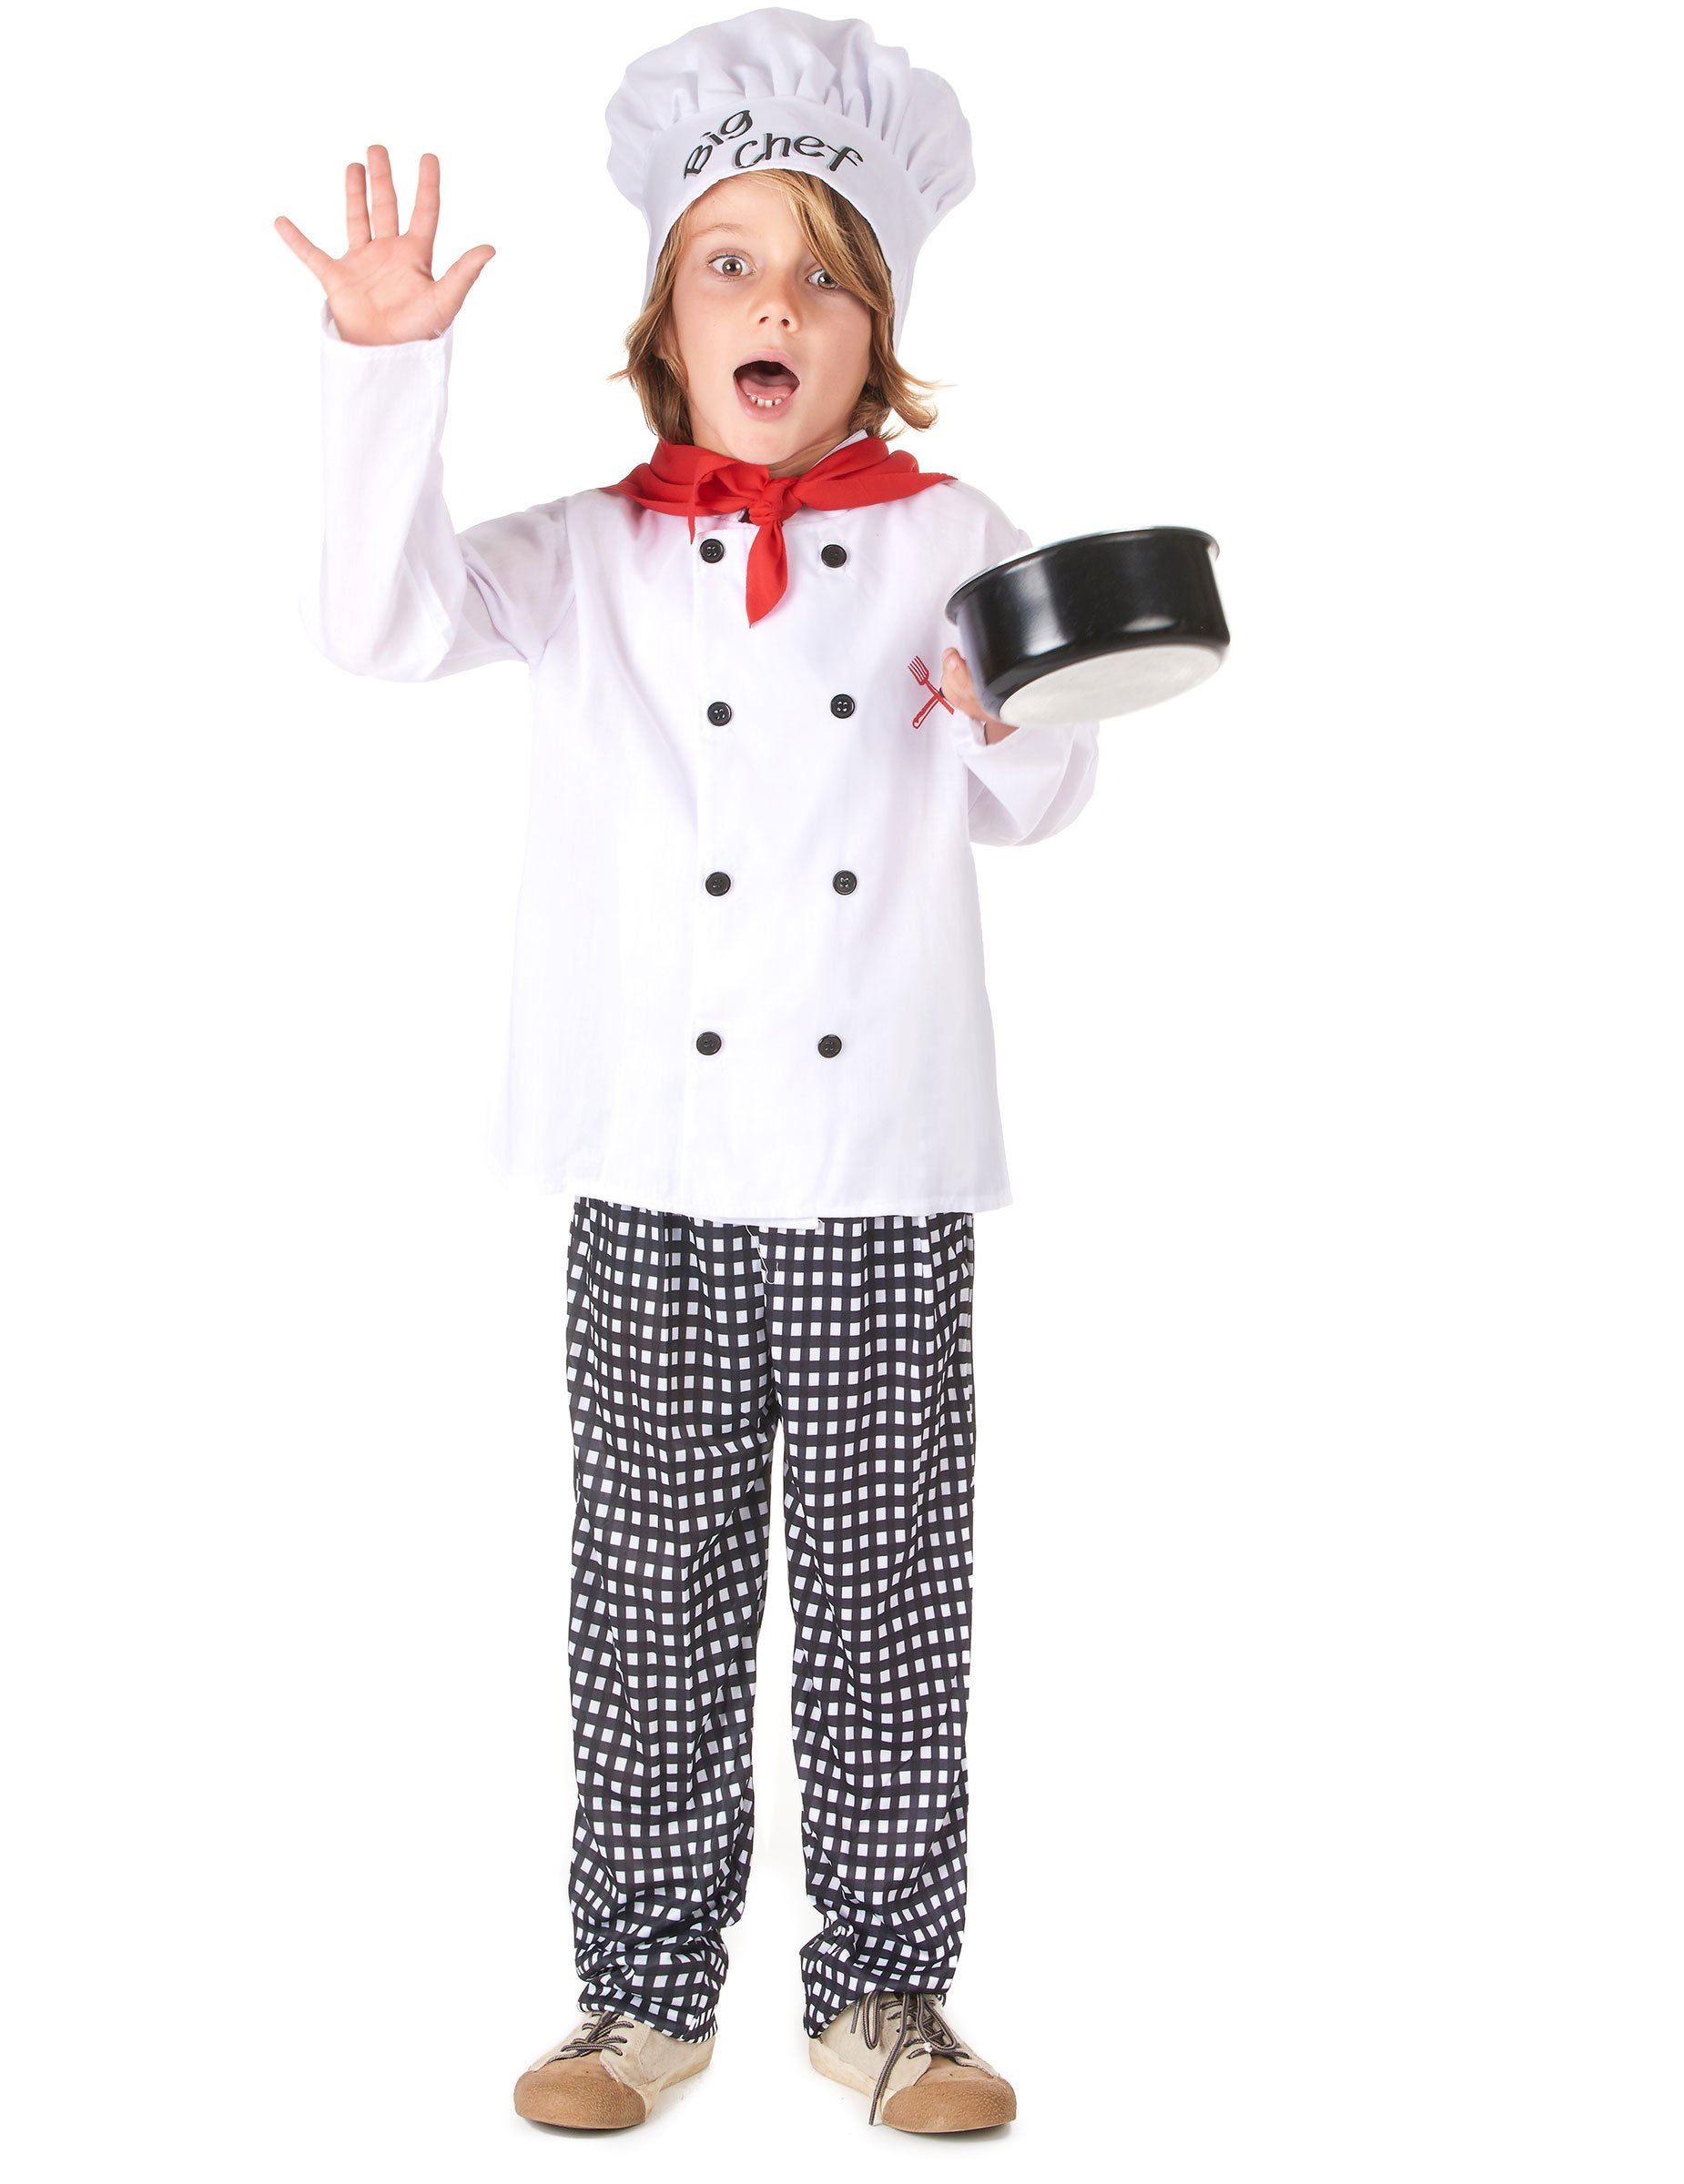 Déguisement chef cuisinier garçon   Deguise-toi, achat de ... e51b282f7854